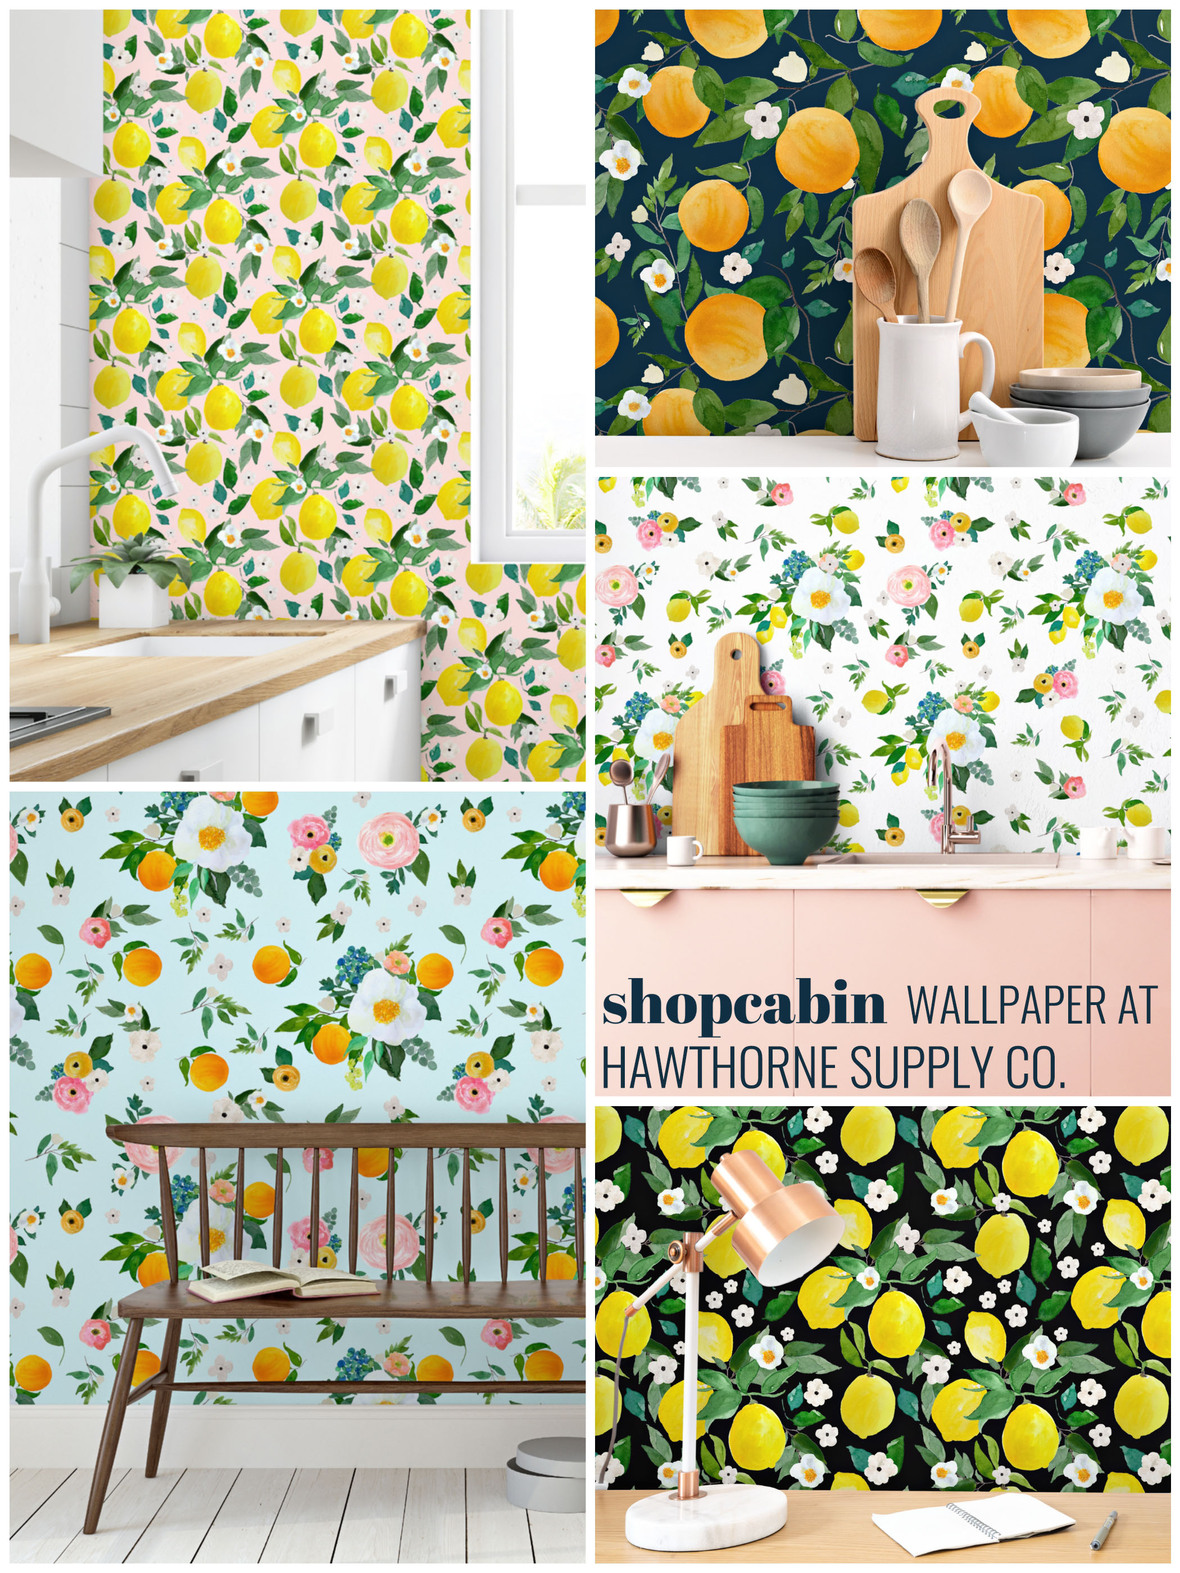 Shopcabin Citrus Grove Wallpaper at Hawthorne Supply Co